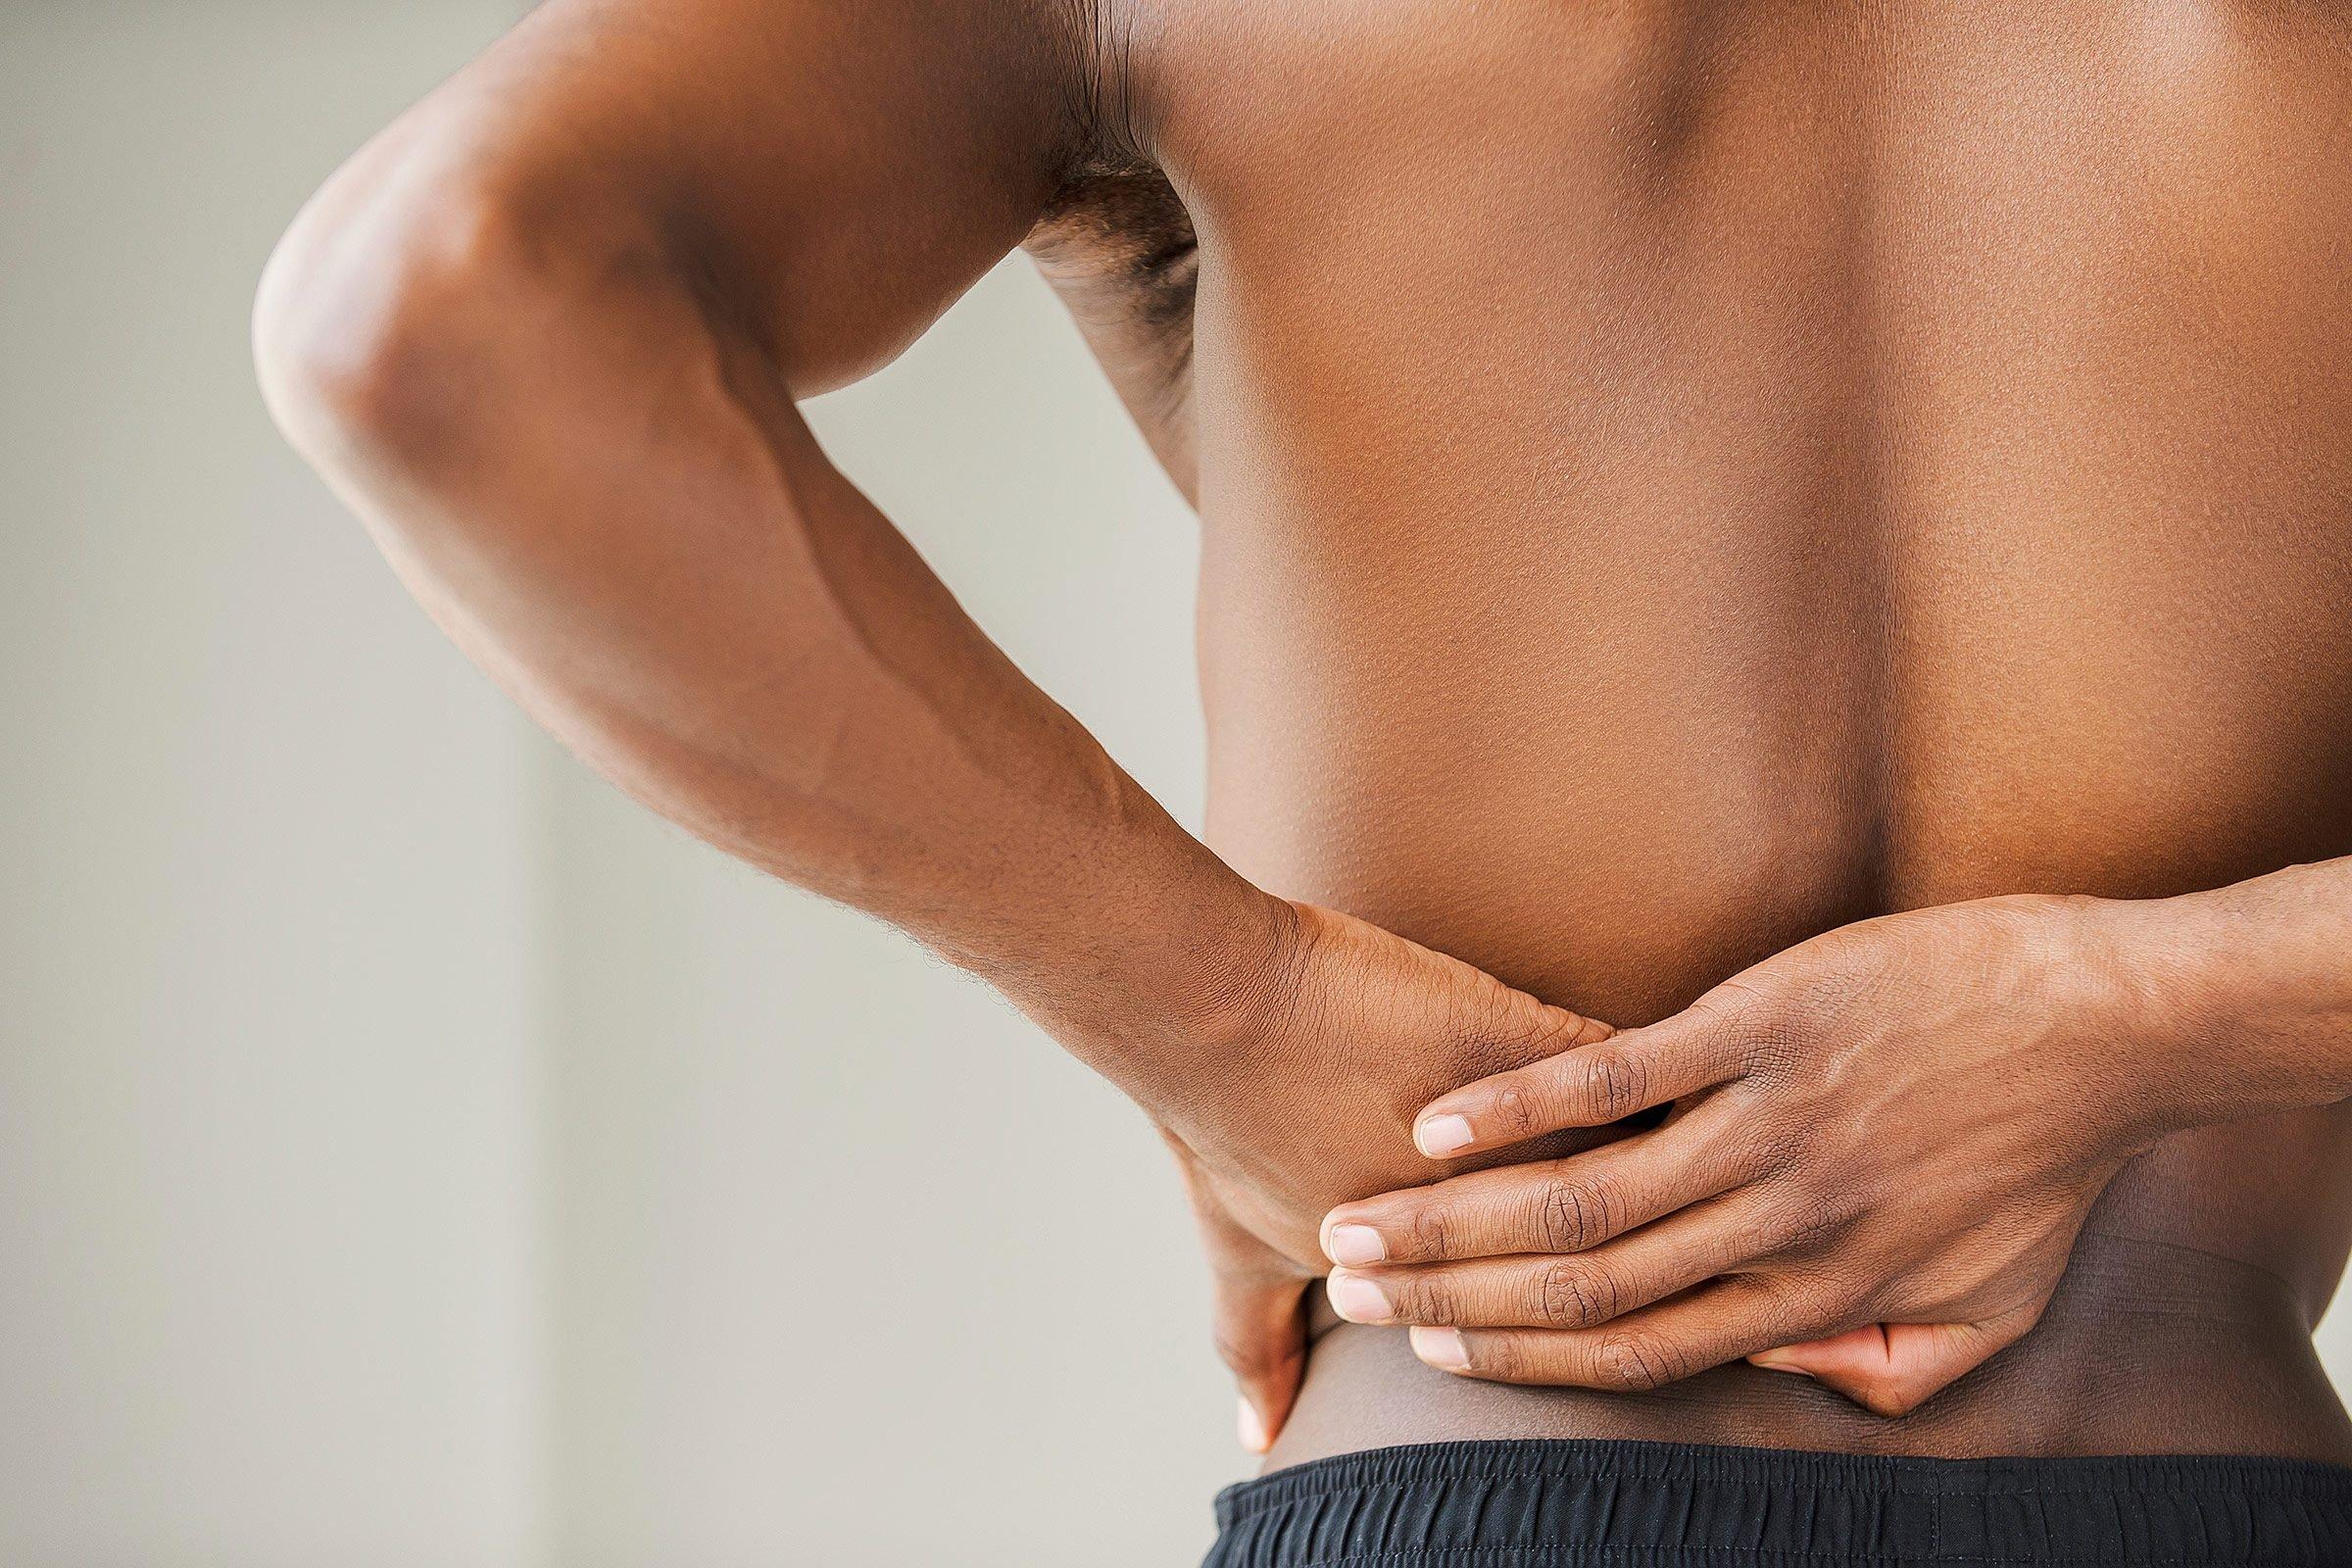 secrets doctors wont tell back pain